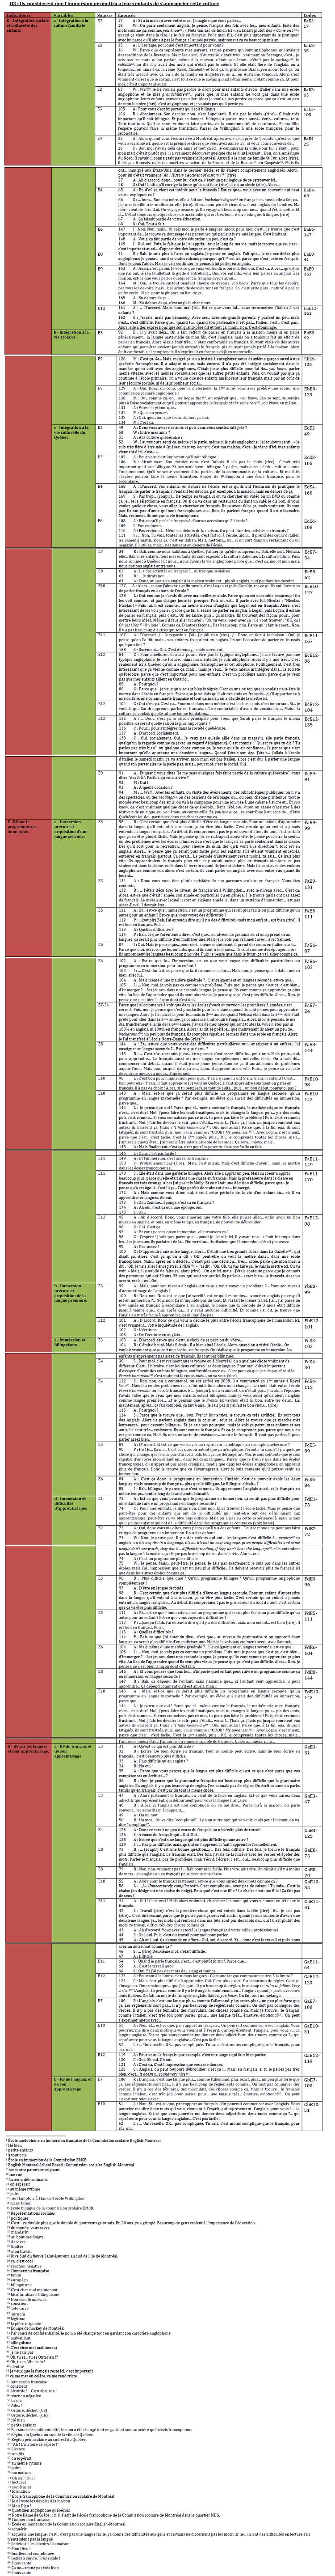 Grille d'analyse du corpus2